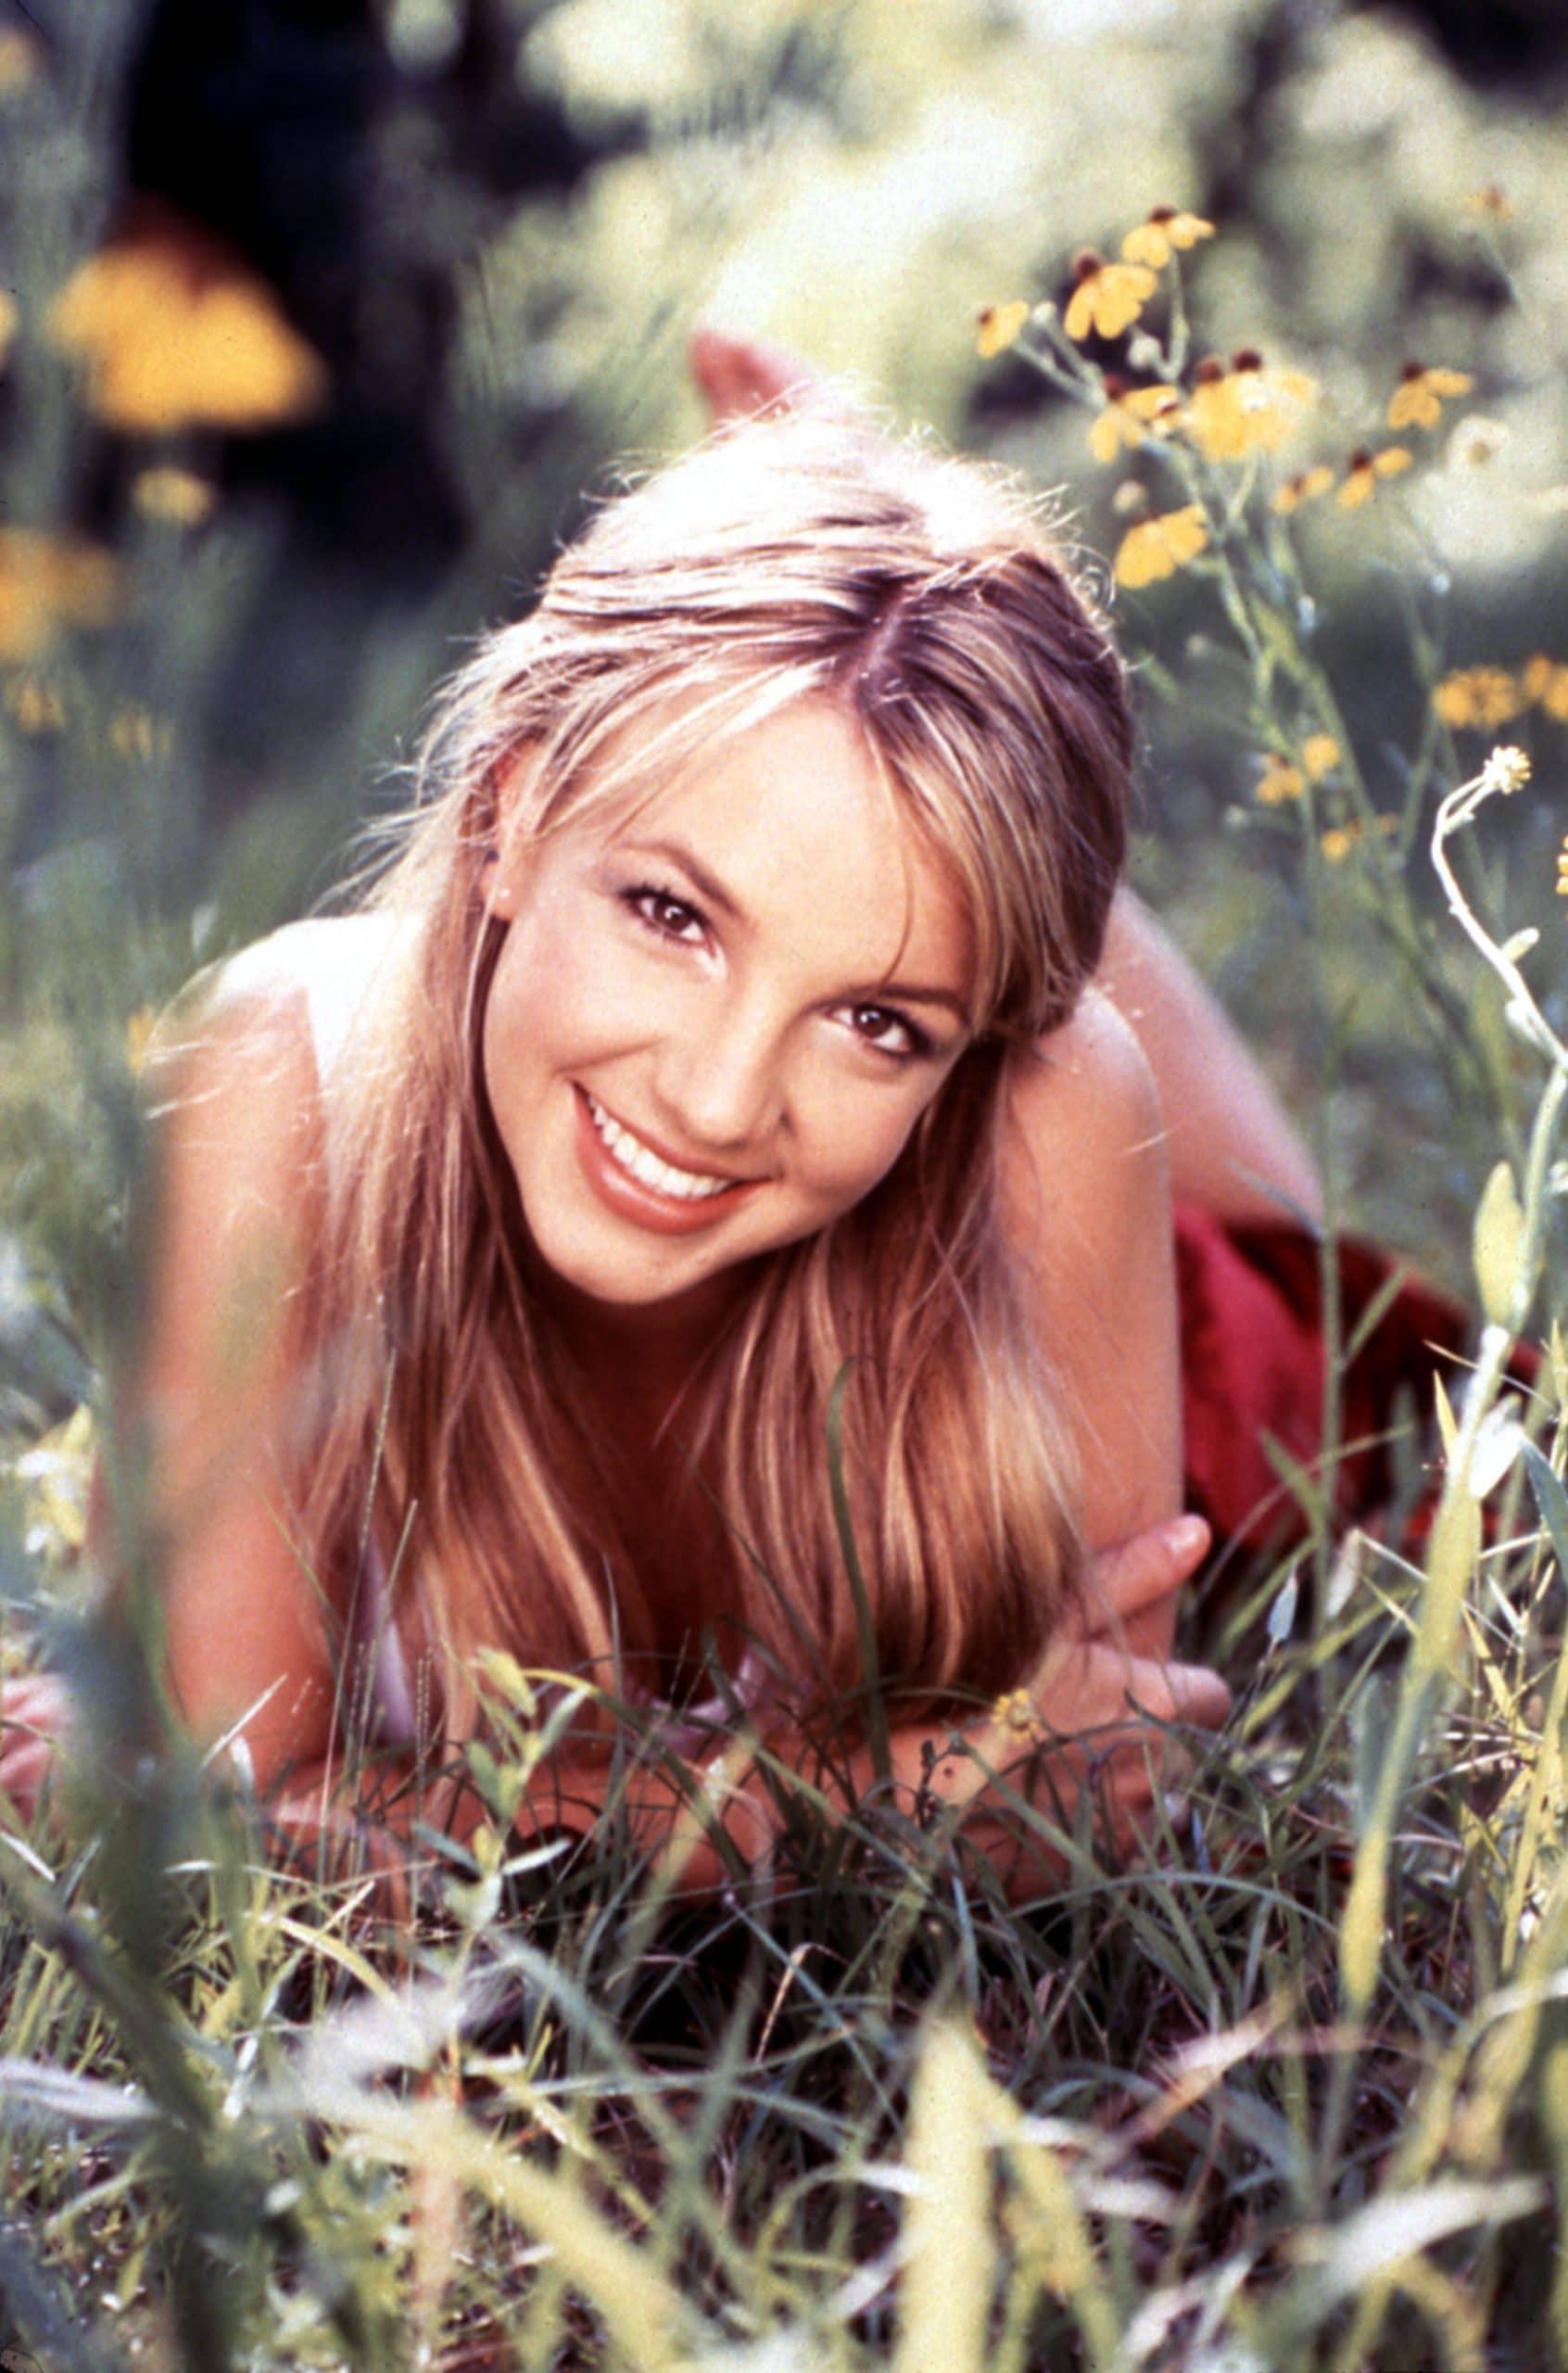 THE 1999 BILLBOARD MUSIC AWARDS, Britney Spears, 1999